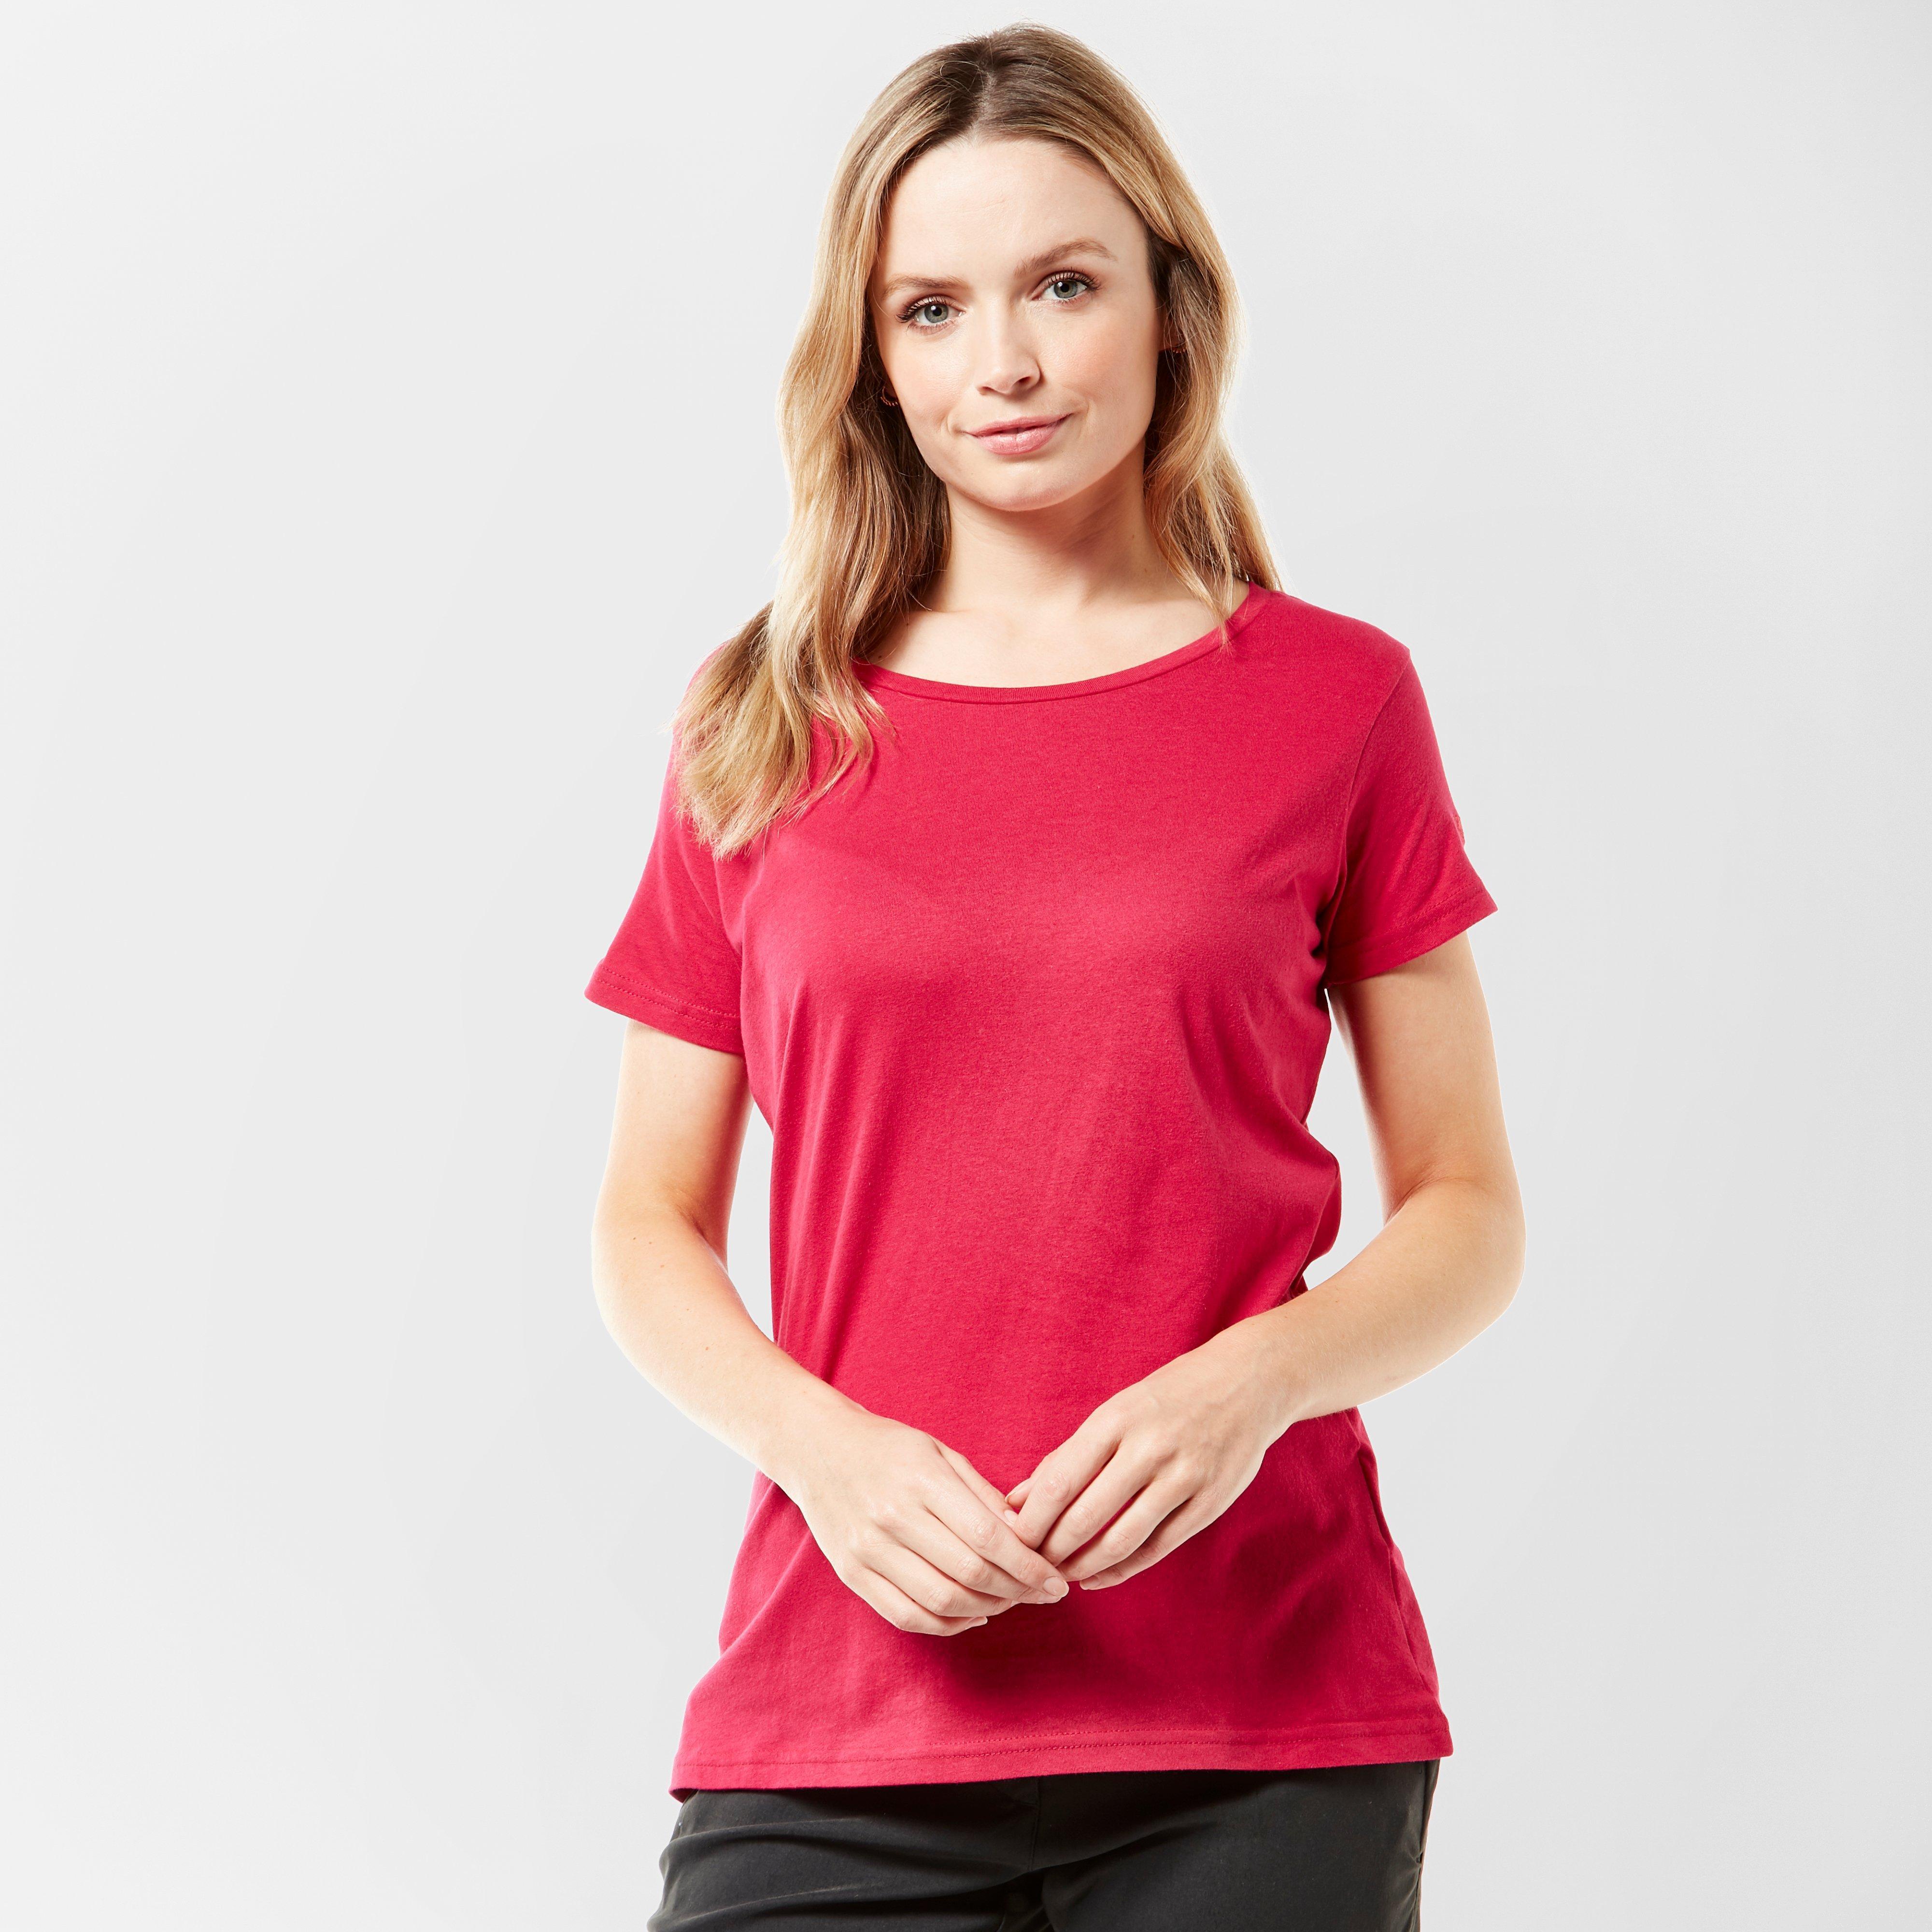 Regatta Regatta Womens Plain T-Shirt - Pink, Pink